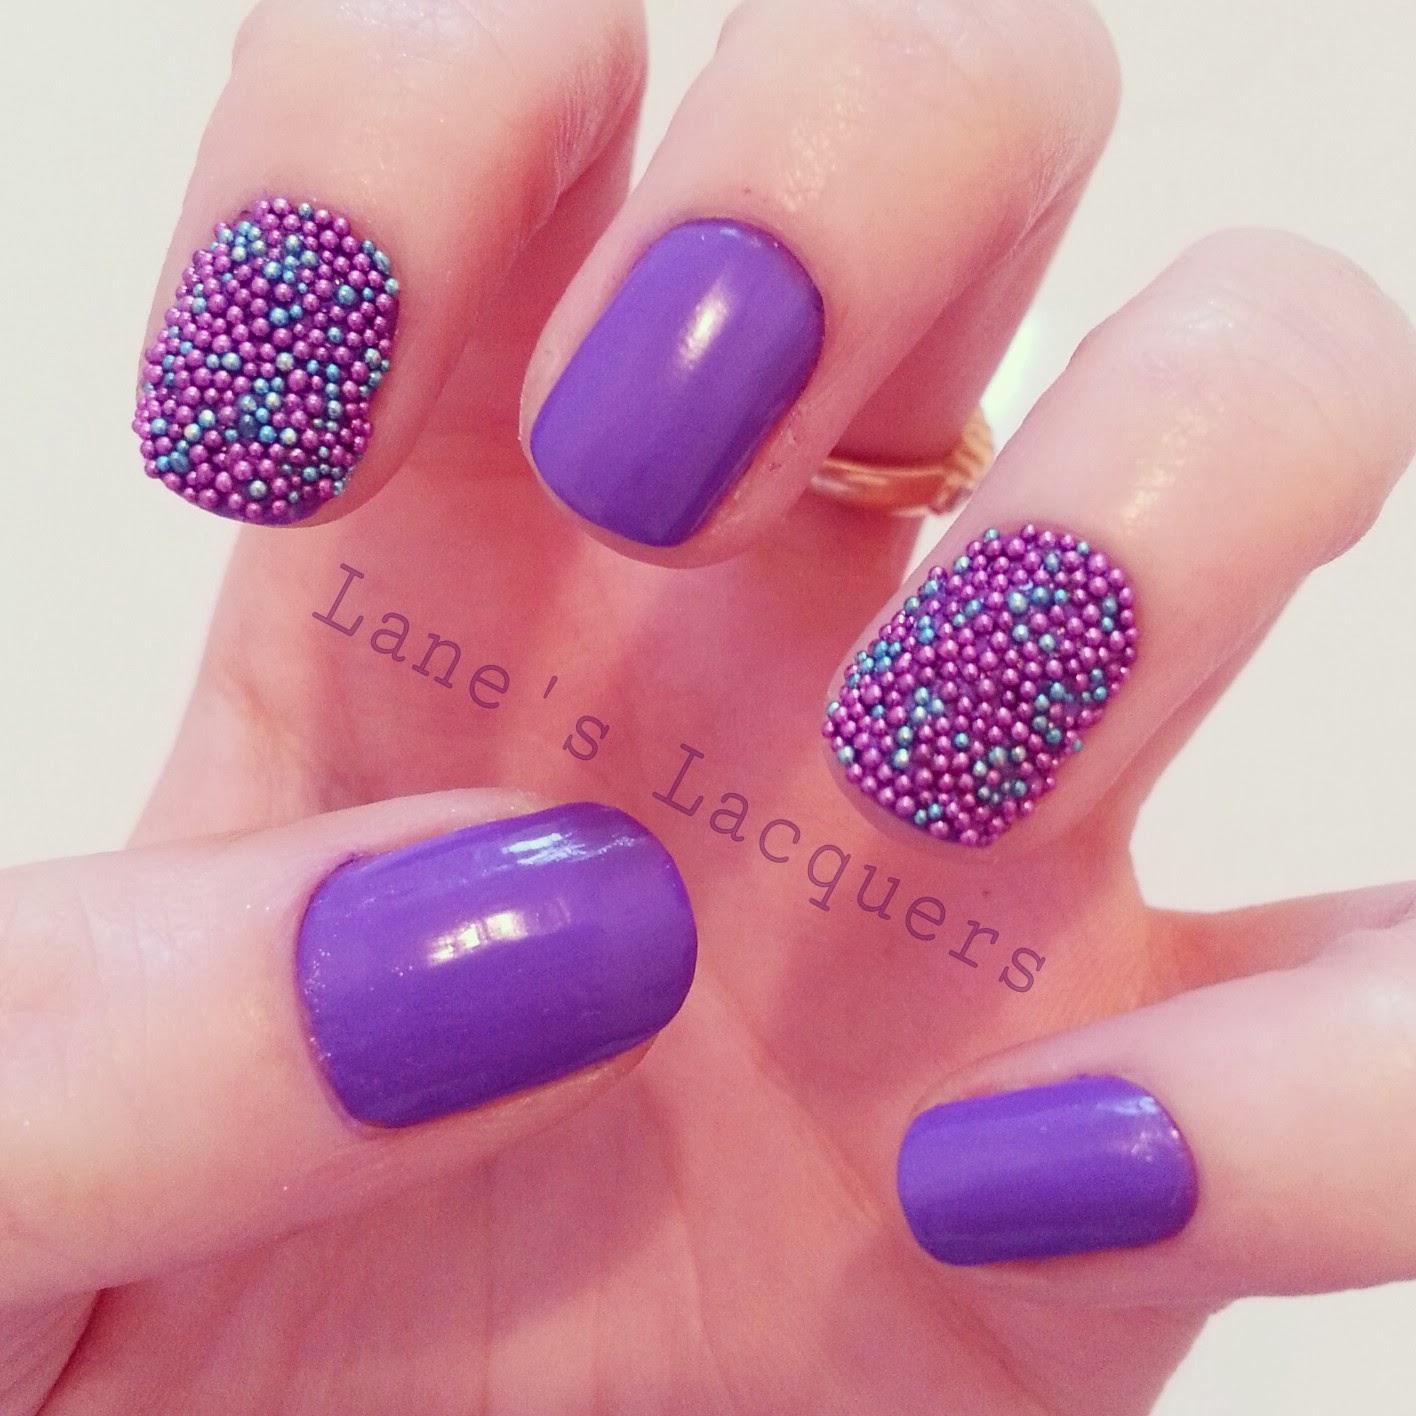 GOT-polish-challenge-purple-caviar-beads-manicure